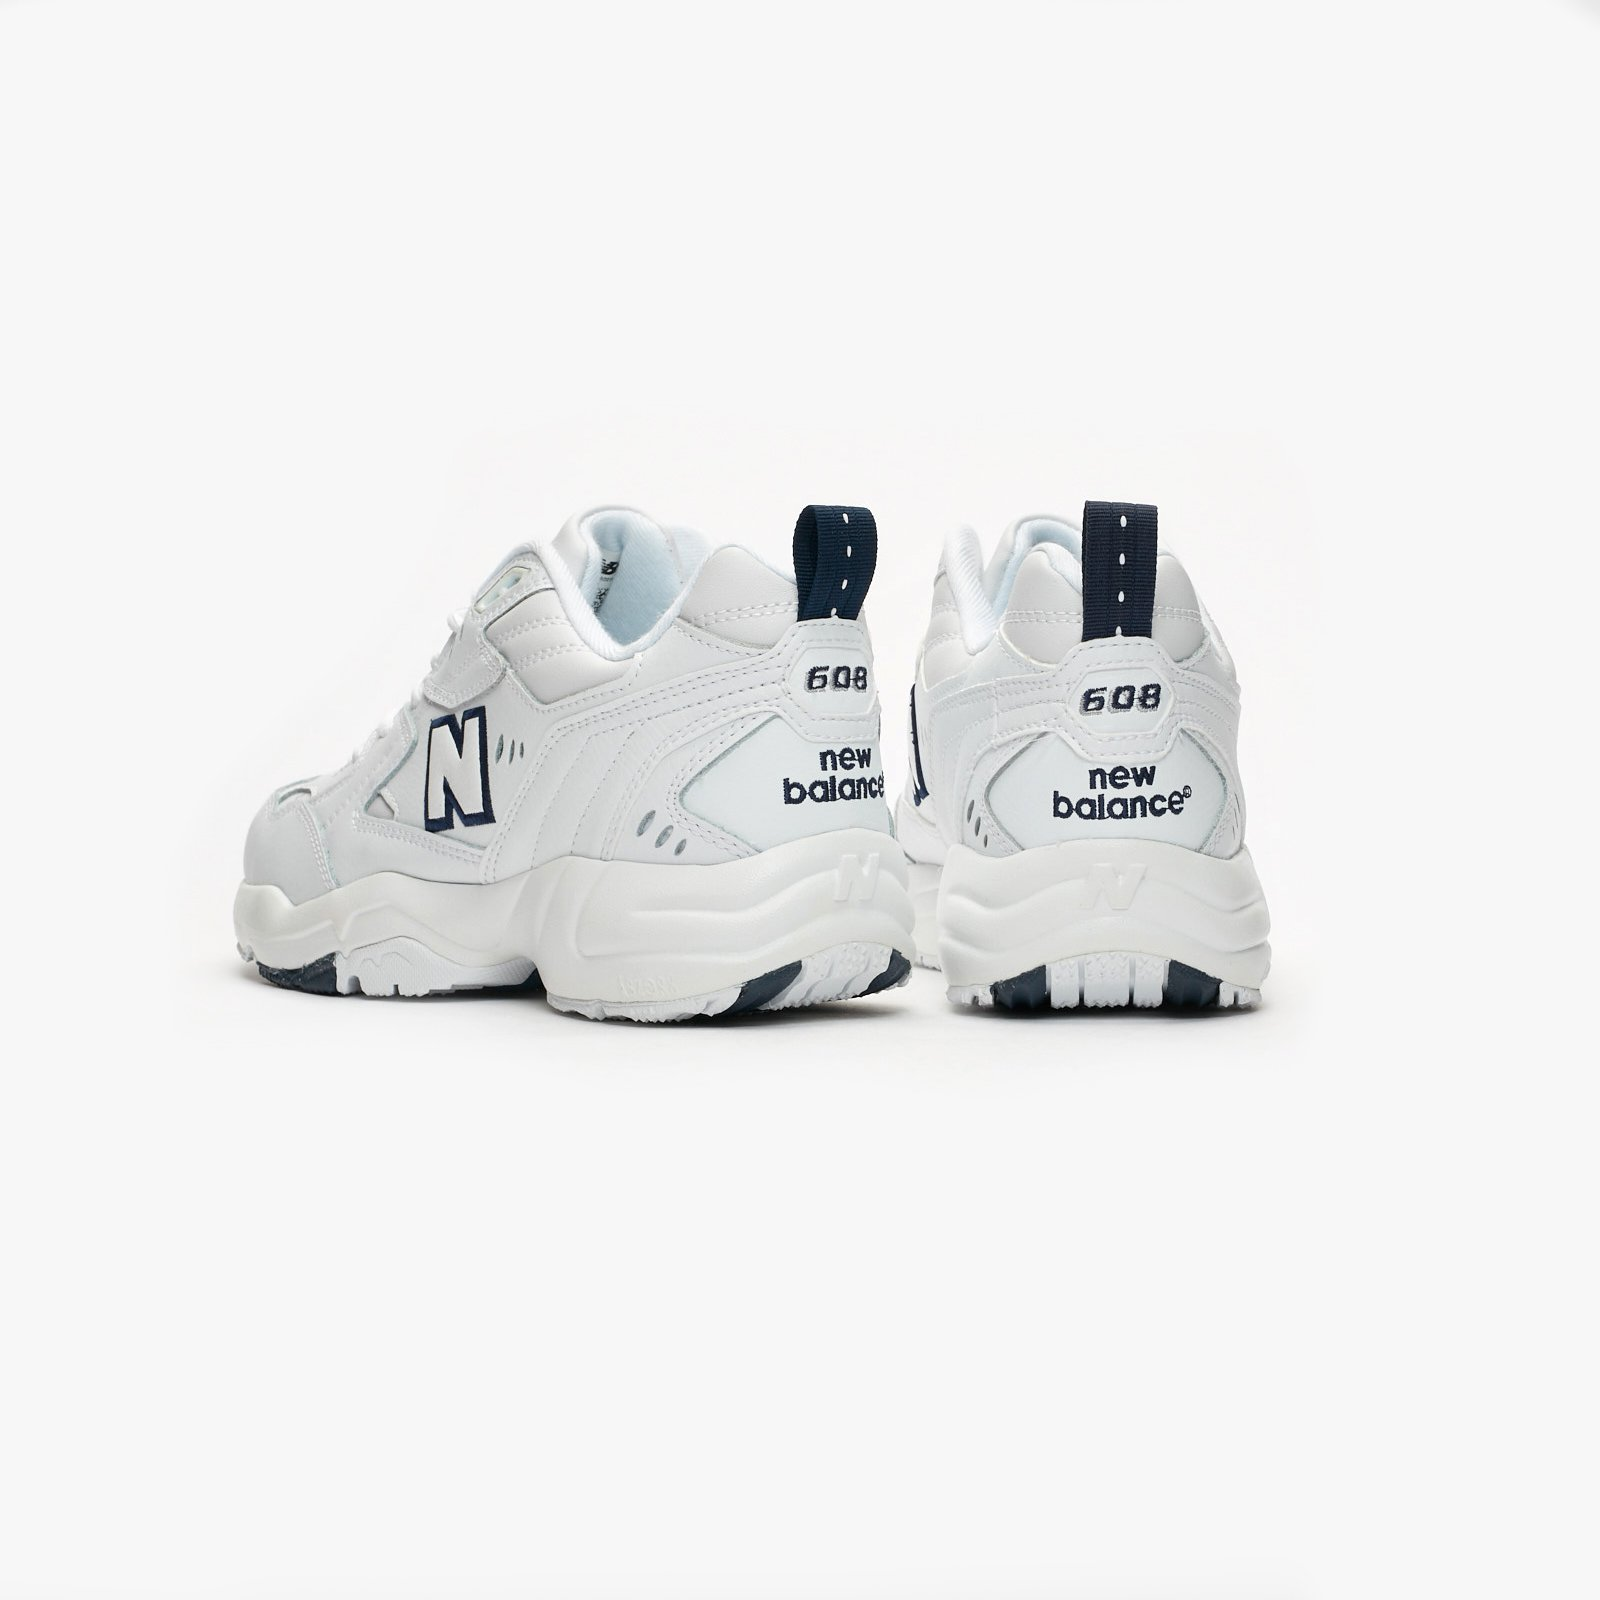 6b595132 New Balance MX608 - Mx608wt - Sneakersnstuff | sneakers & streetwear ...